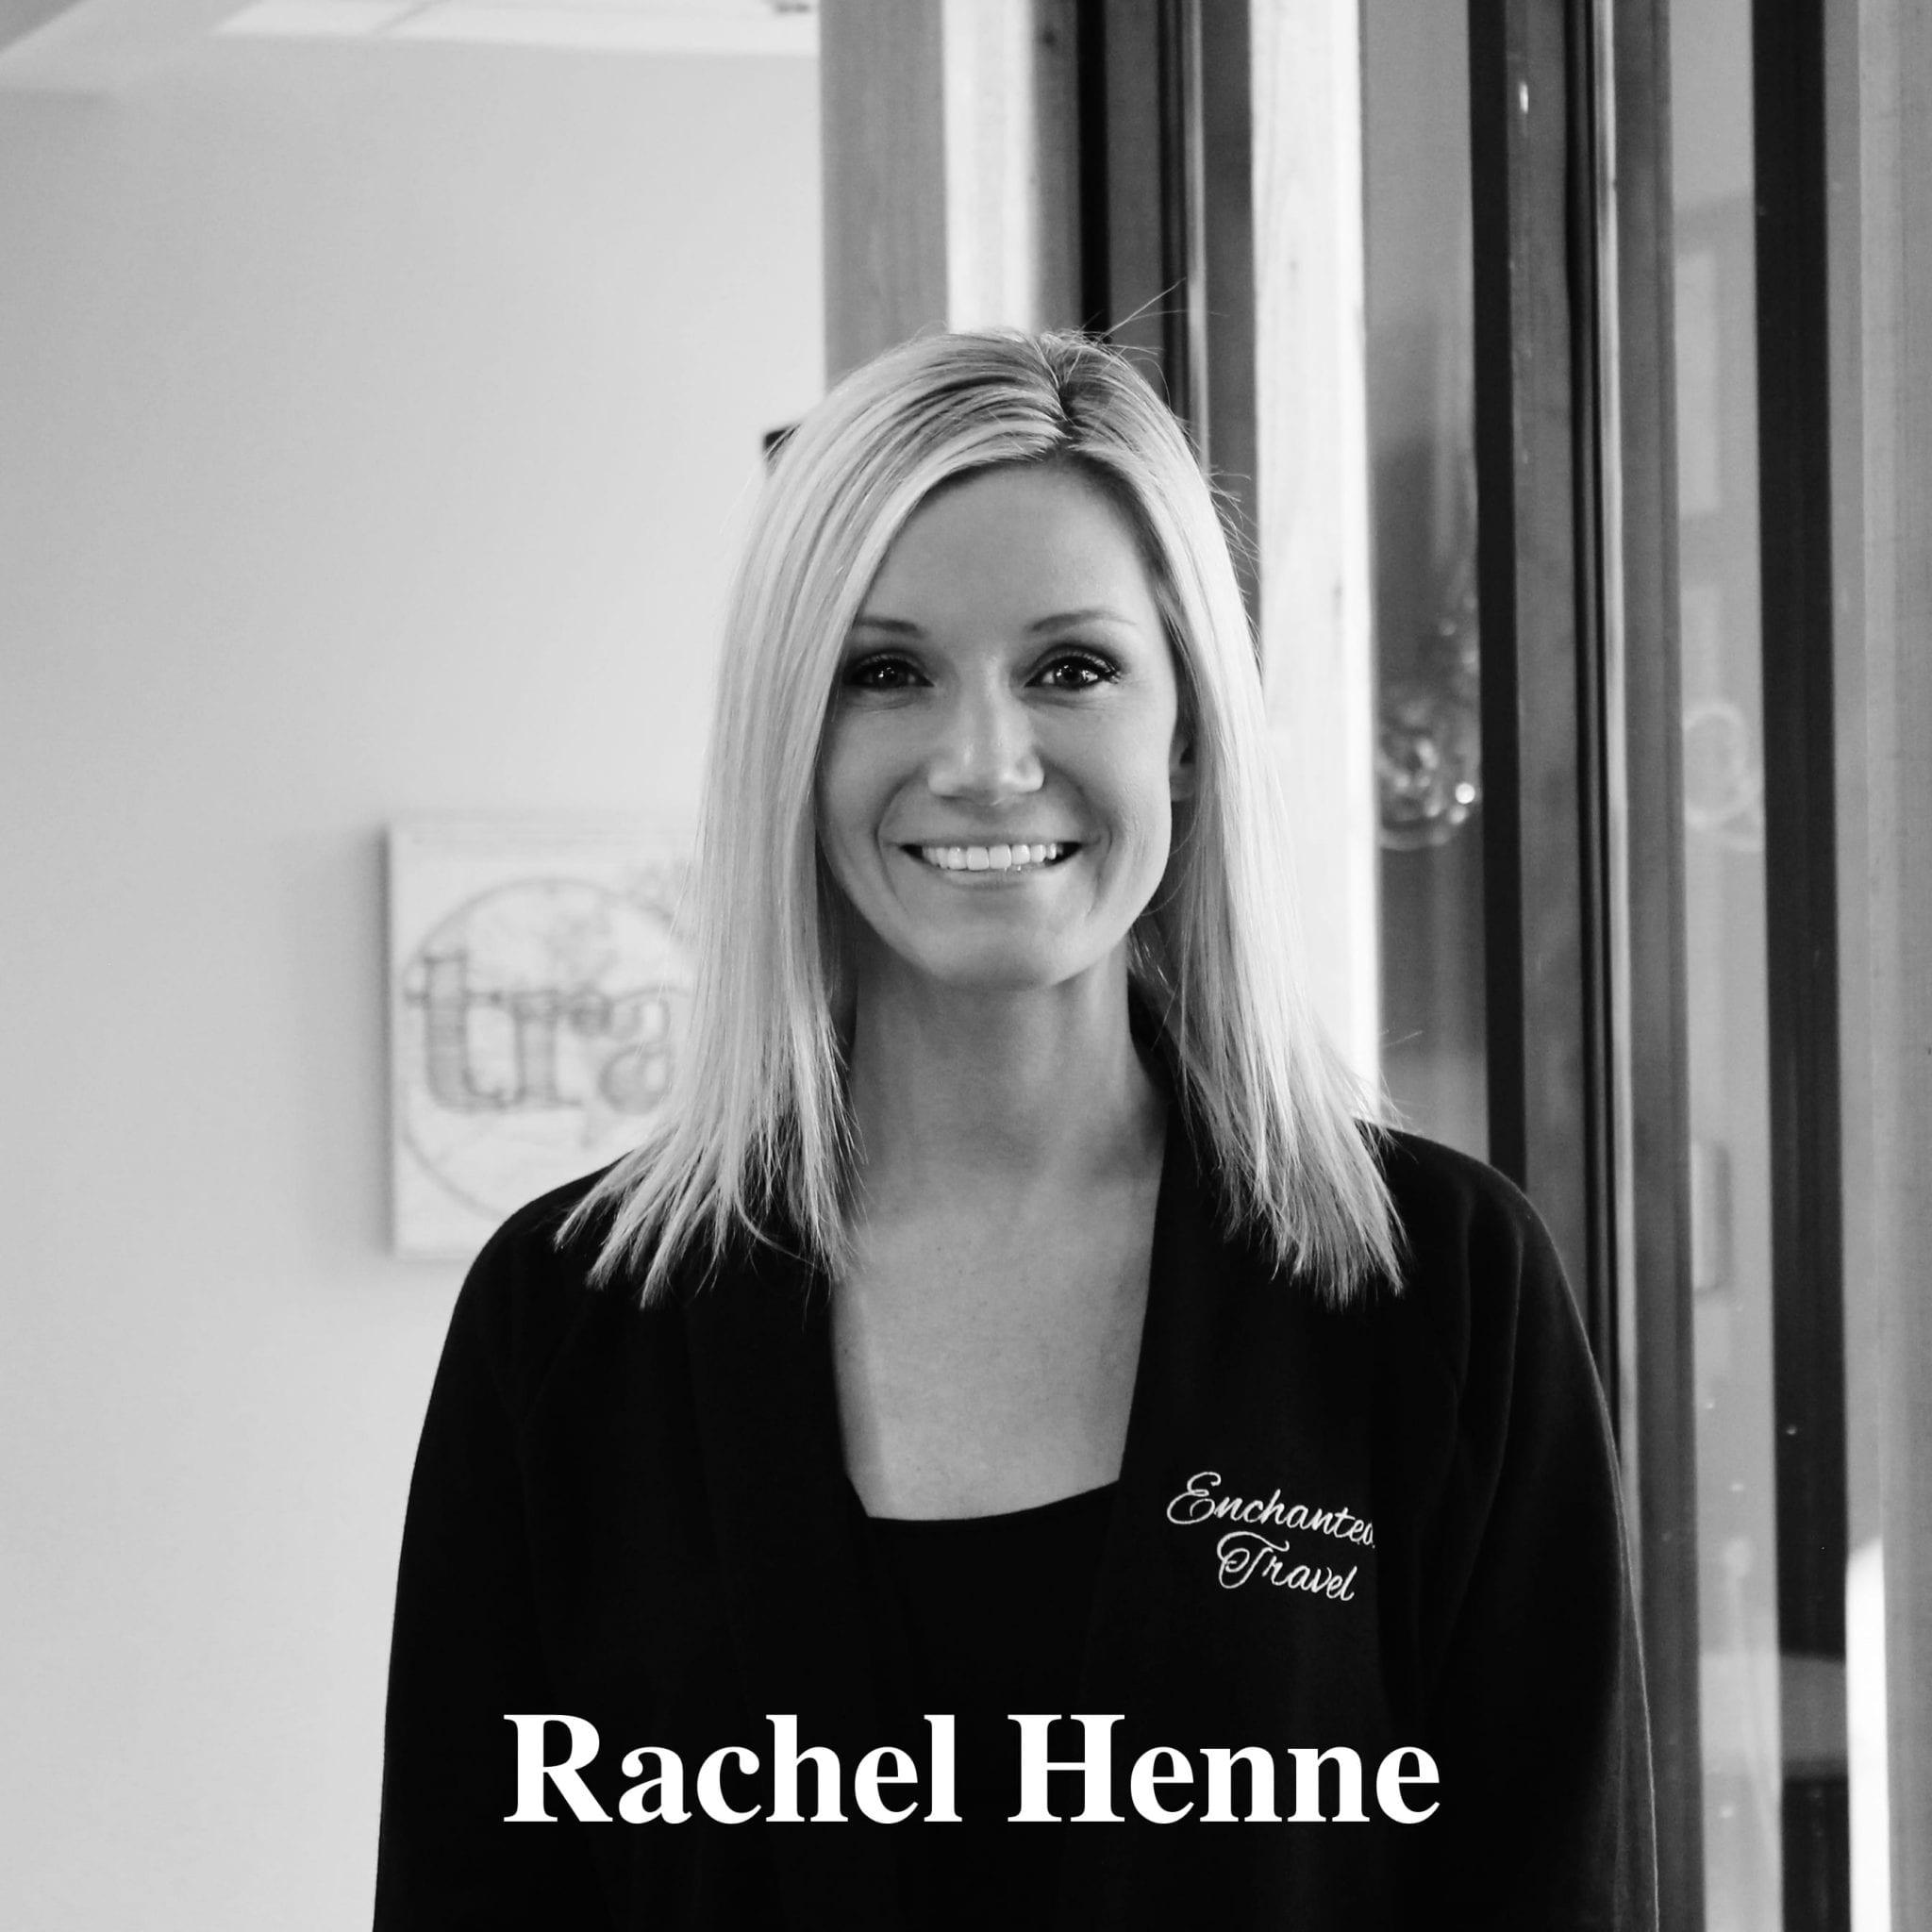 Rachel Henne